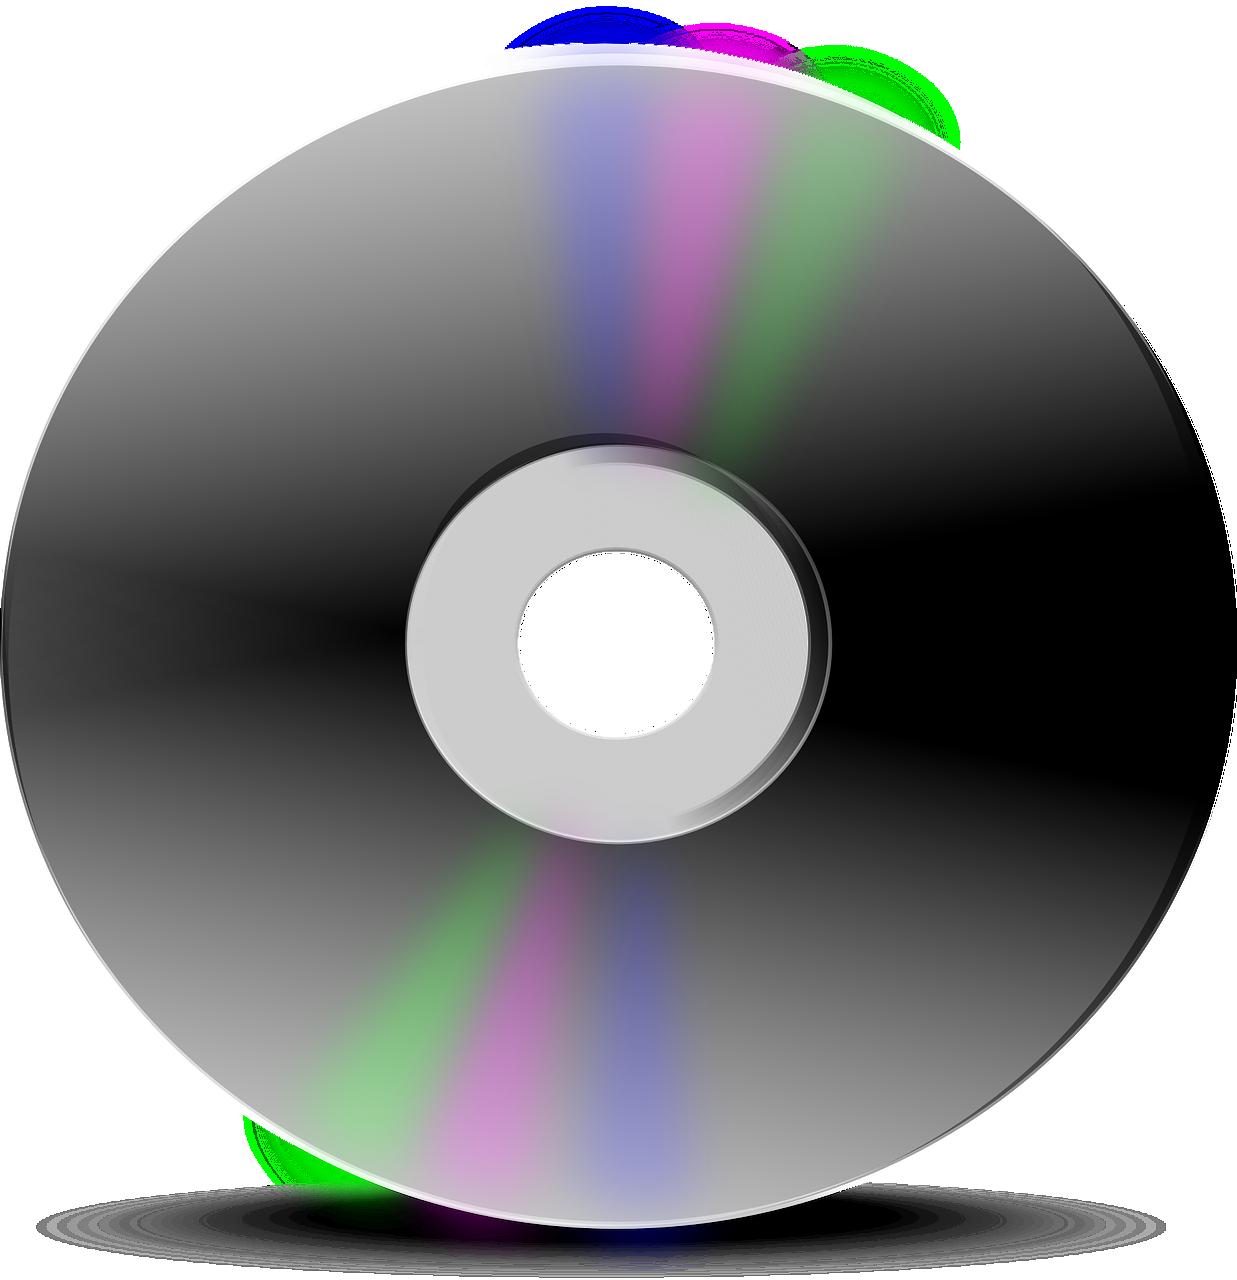 Создание картинки на диске